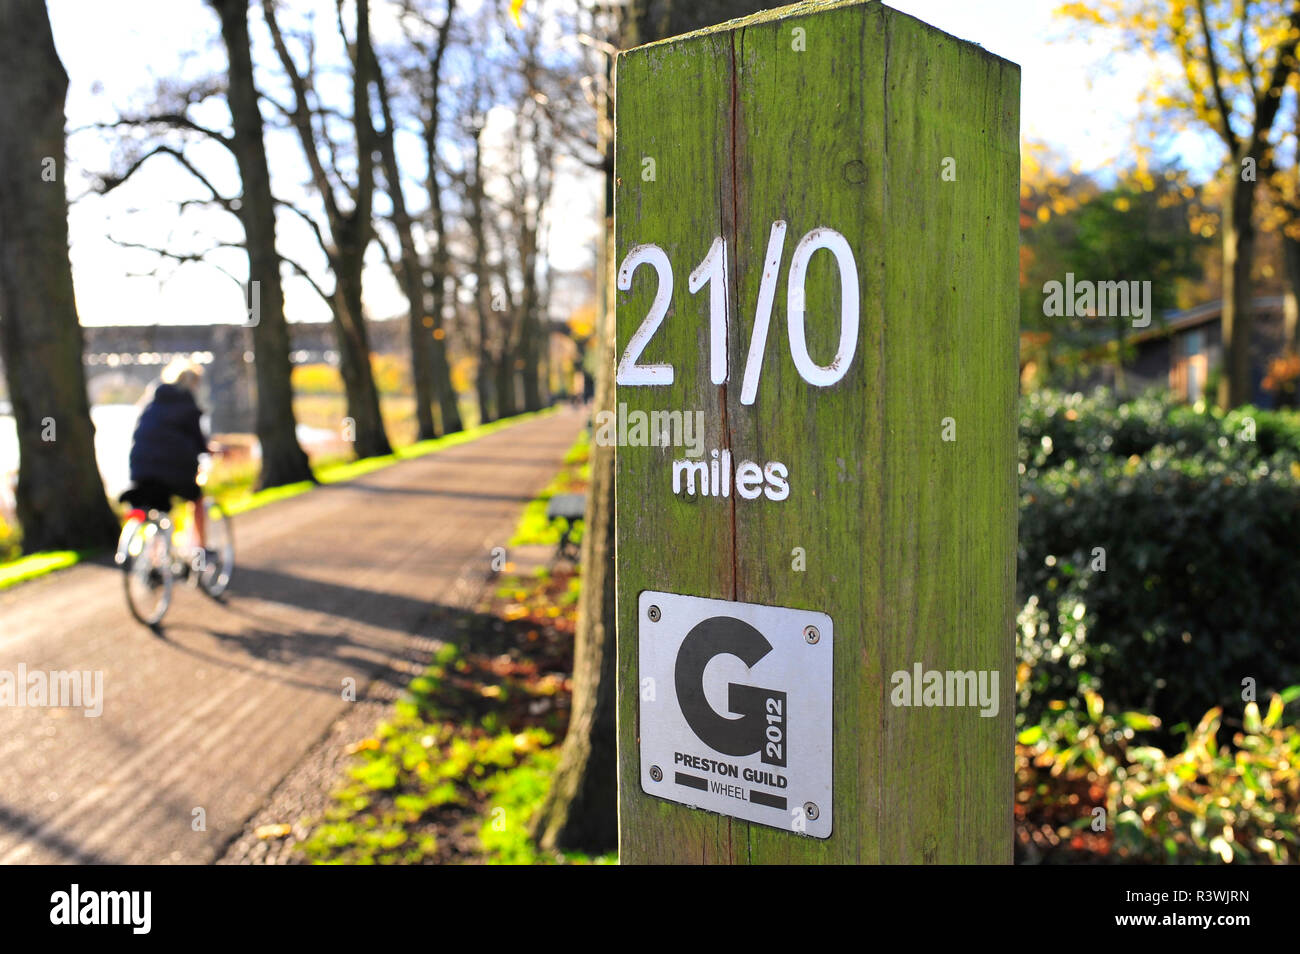 Start and finish post of the Preston Guild walking,running